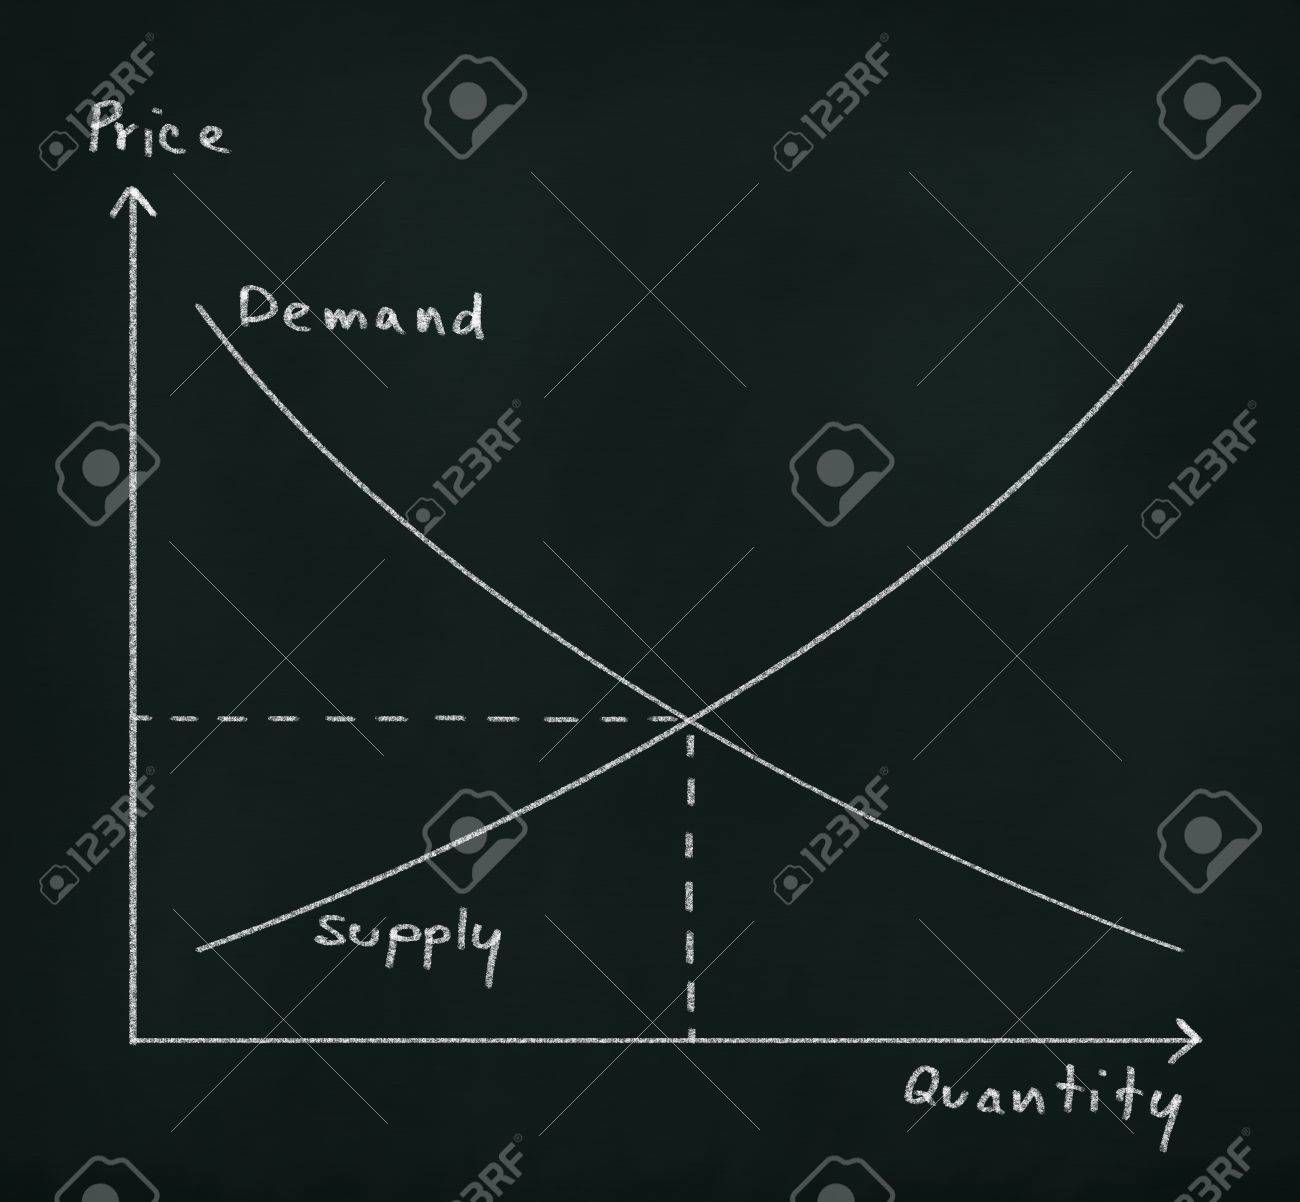 deaman supply graph drawing on chalkboard - 13241688